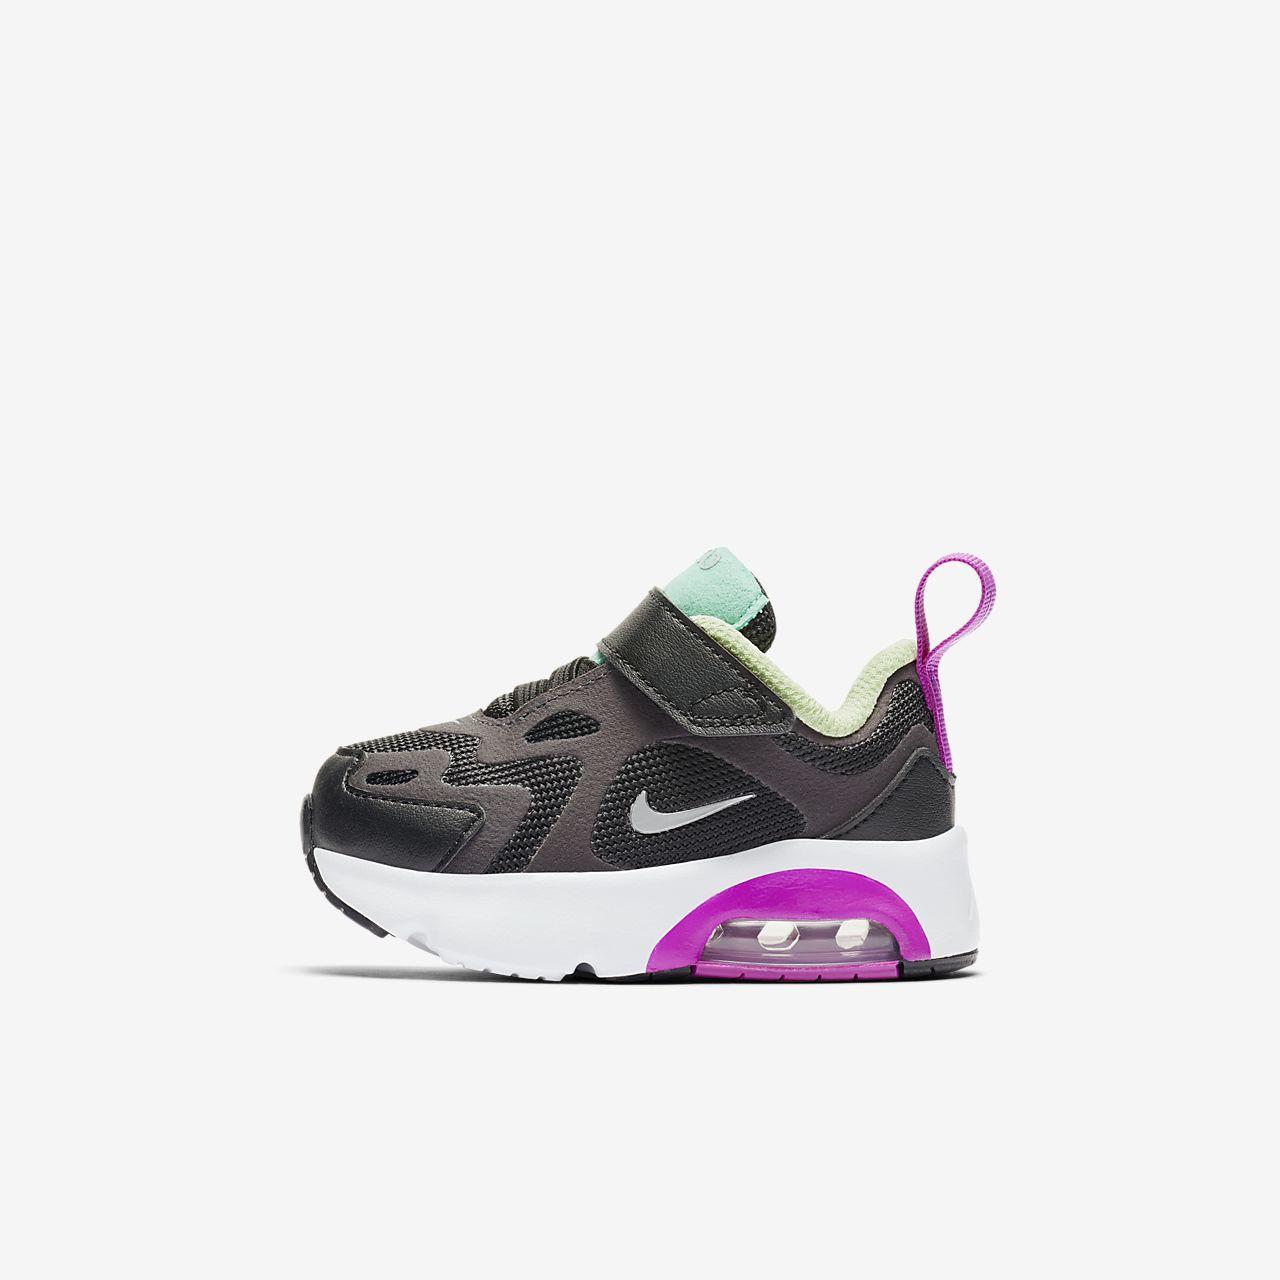 Sapatilhas Nike Air Max 200 para bebé